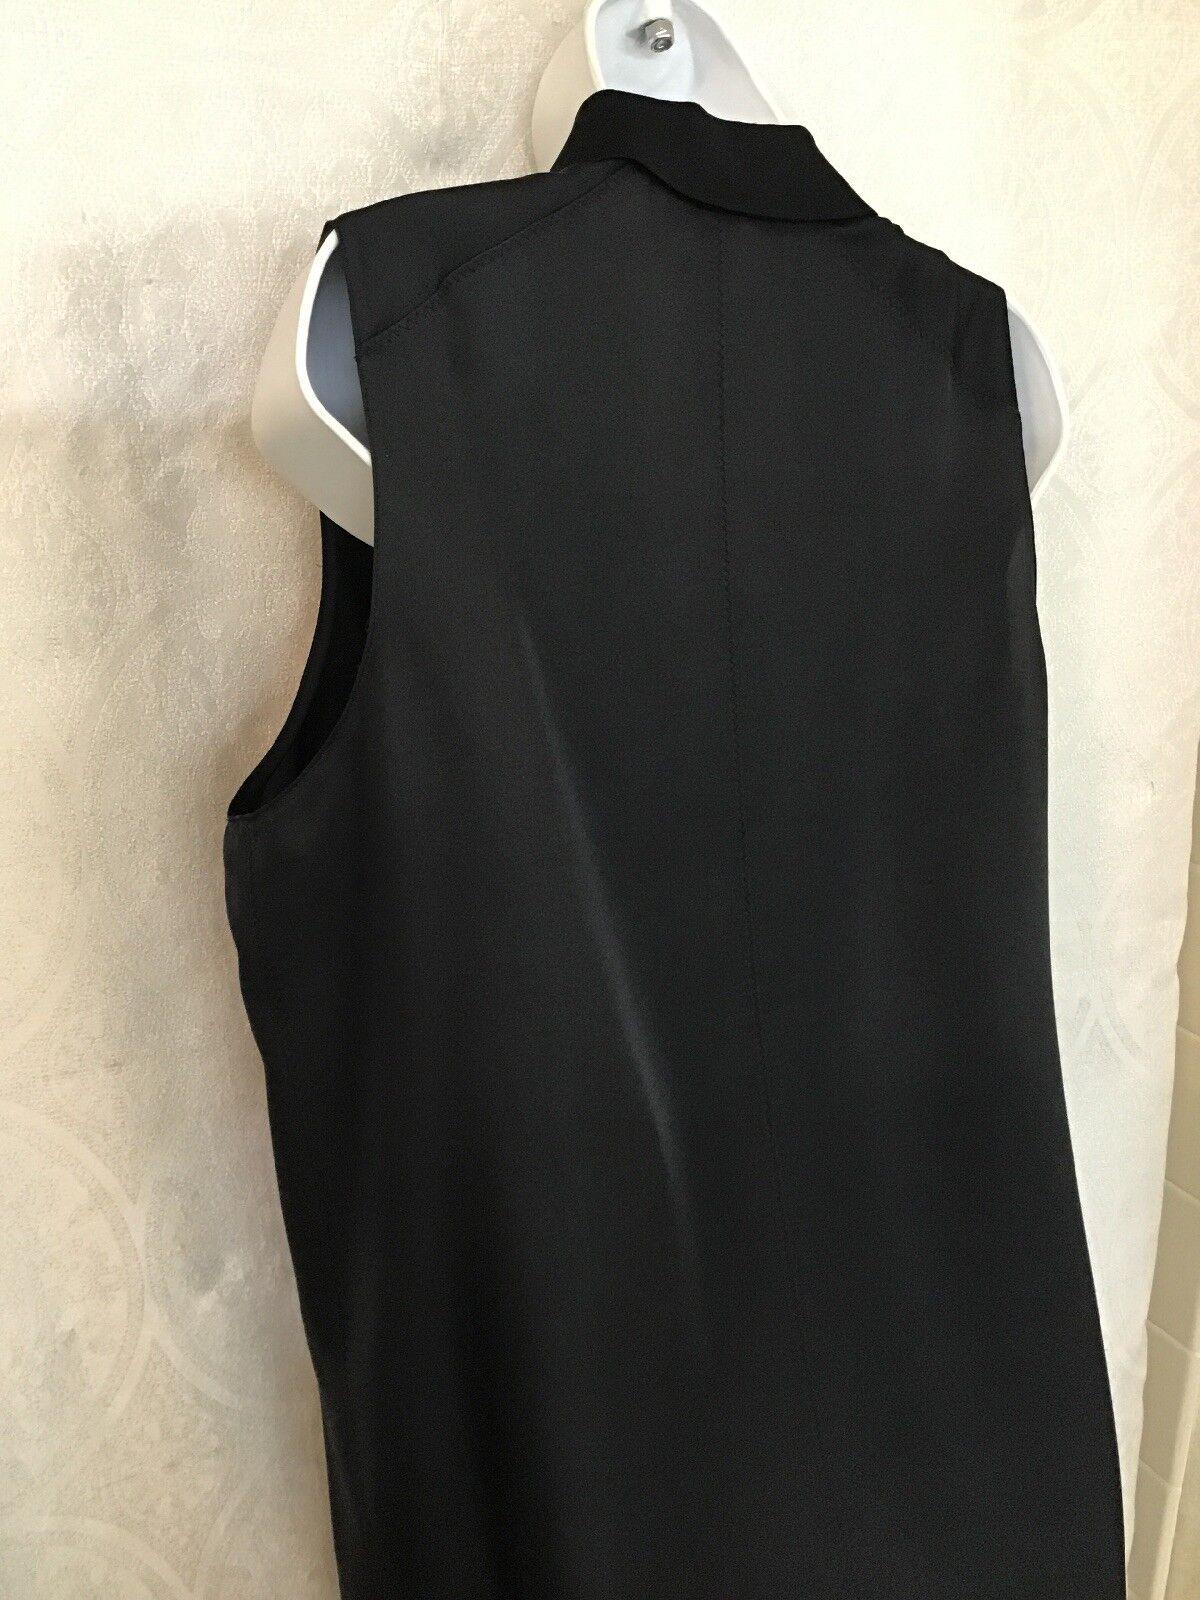 Rag And Bone Blouse Black Silk Sleeveless Three B… - image 6